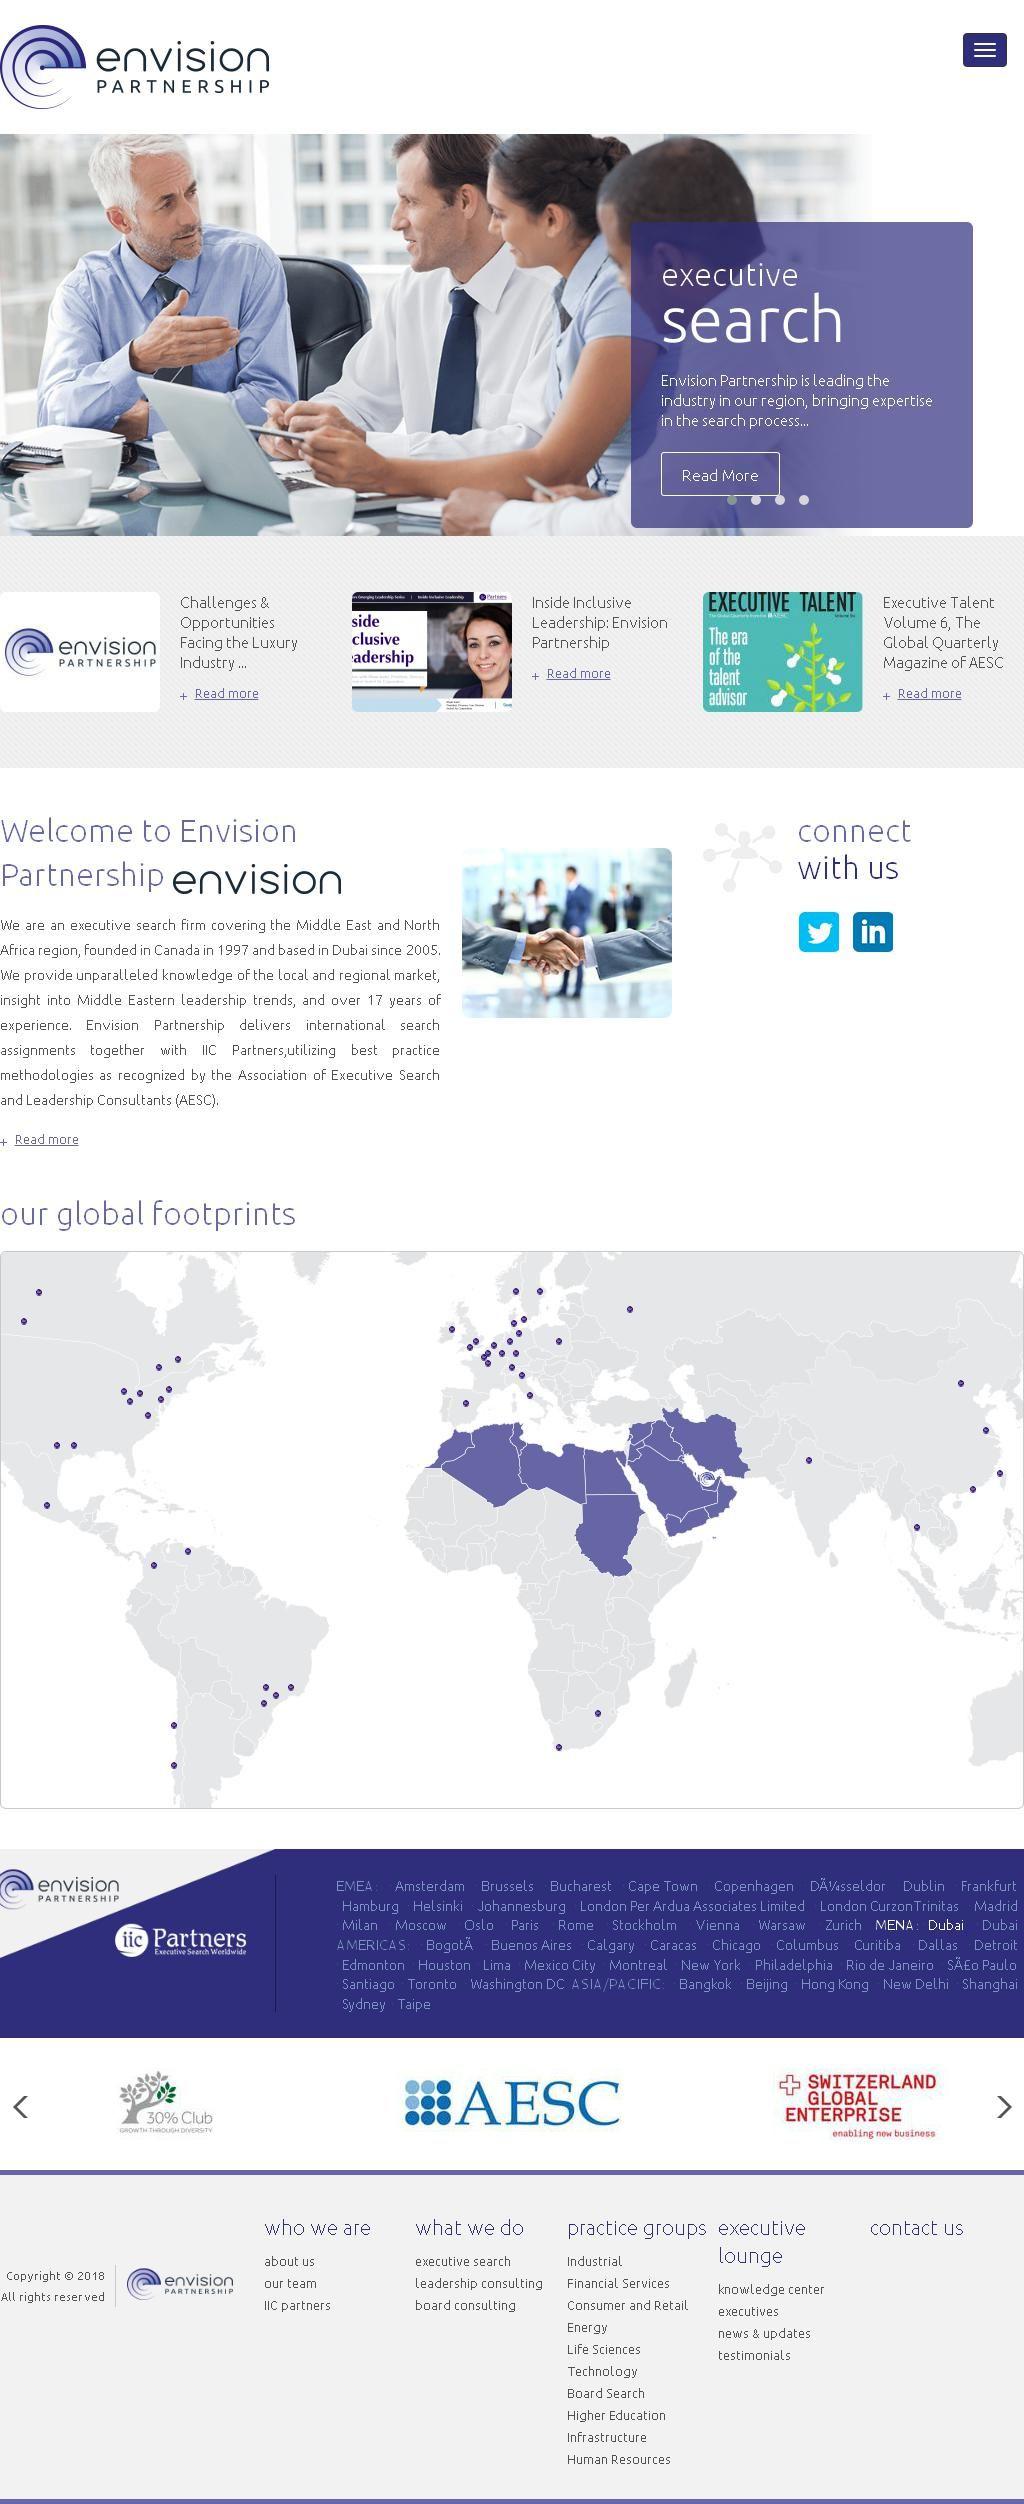 Envision Partnership Company Bay Square 11 11 Al Abraj Street 4